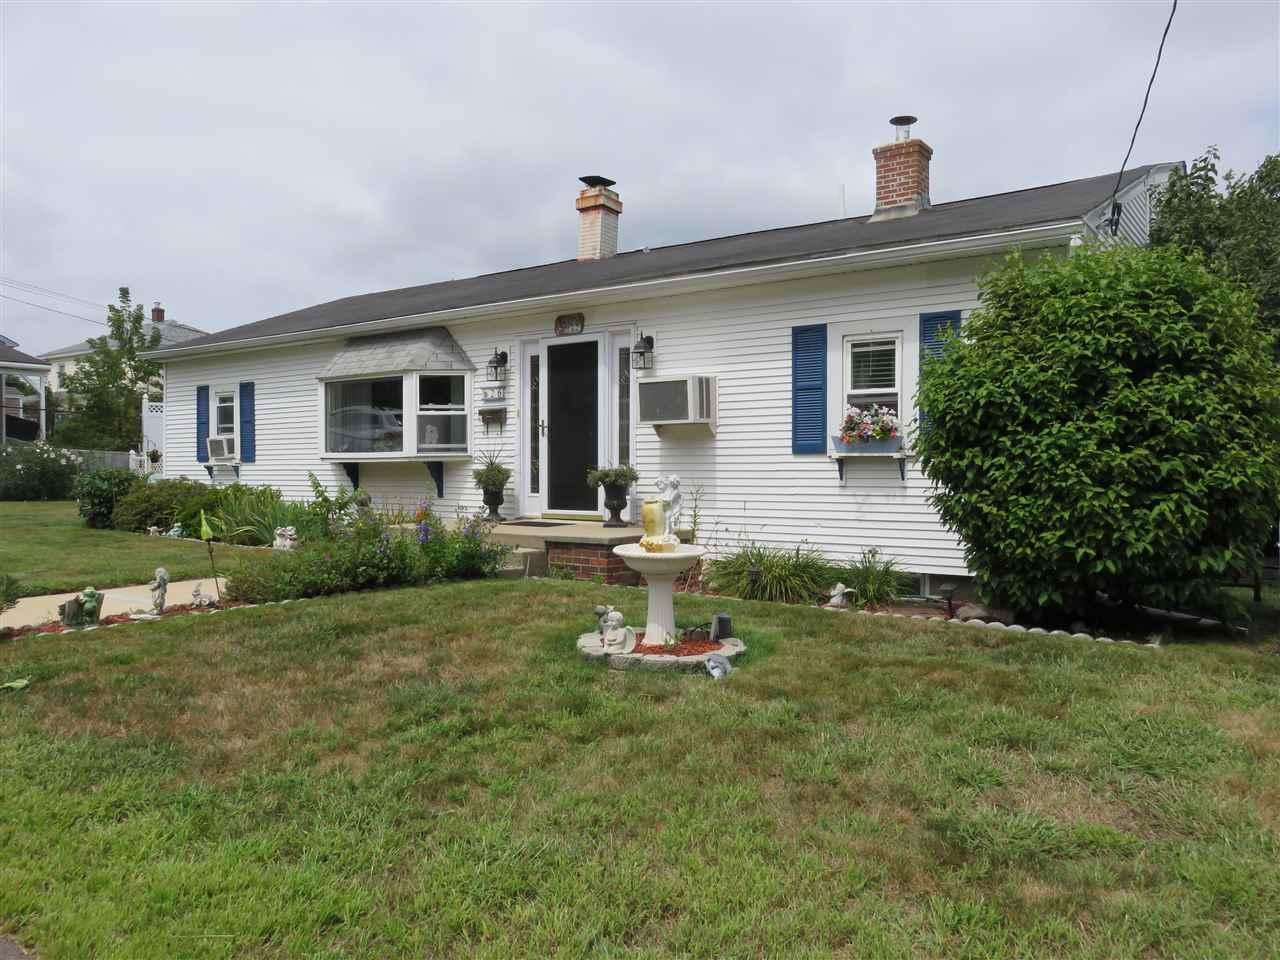 Homes For Sale Allenstown Nh